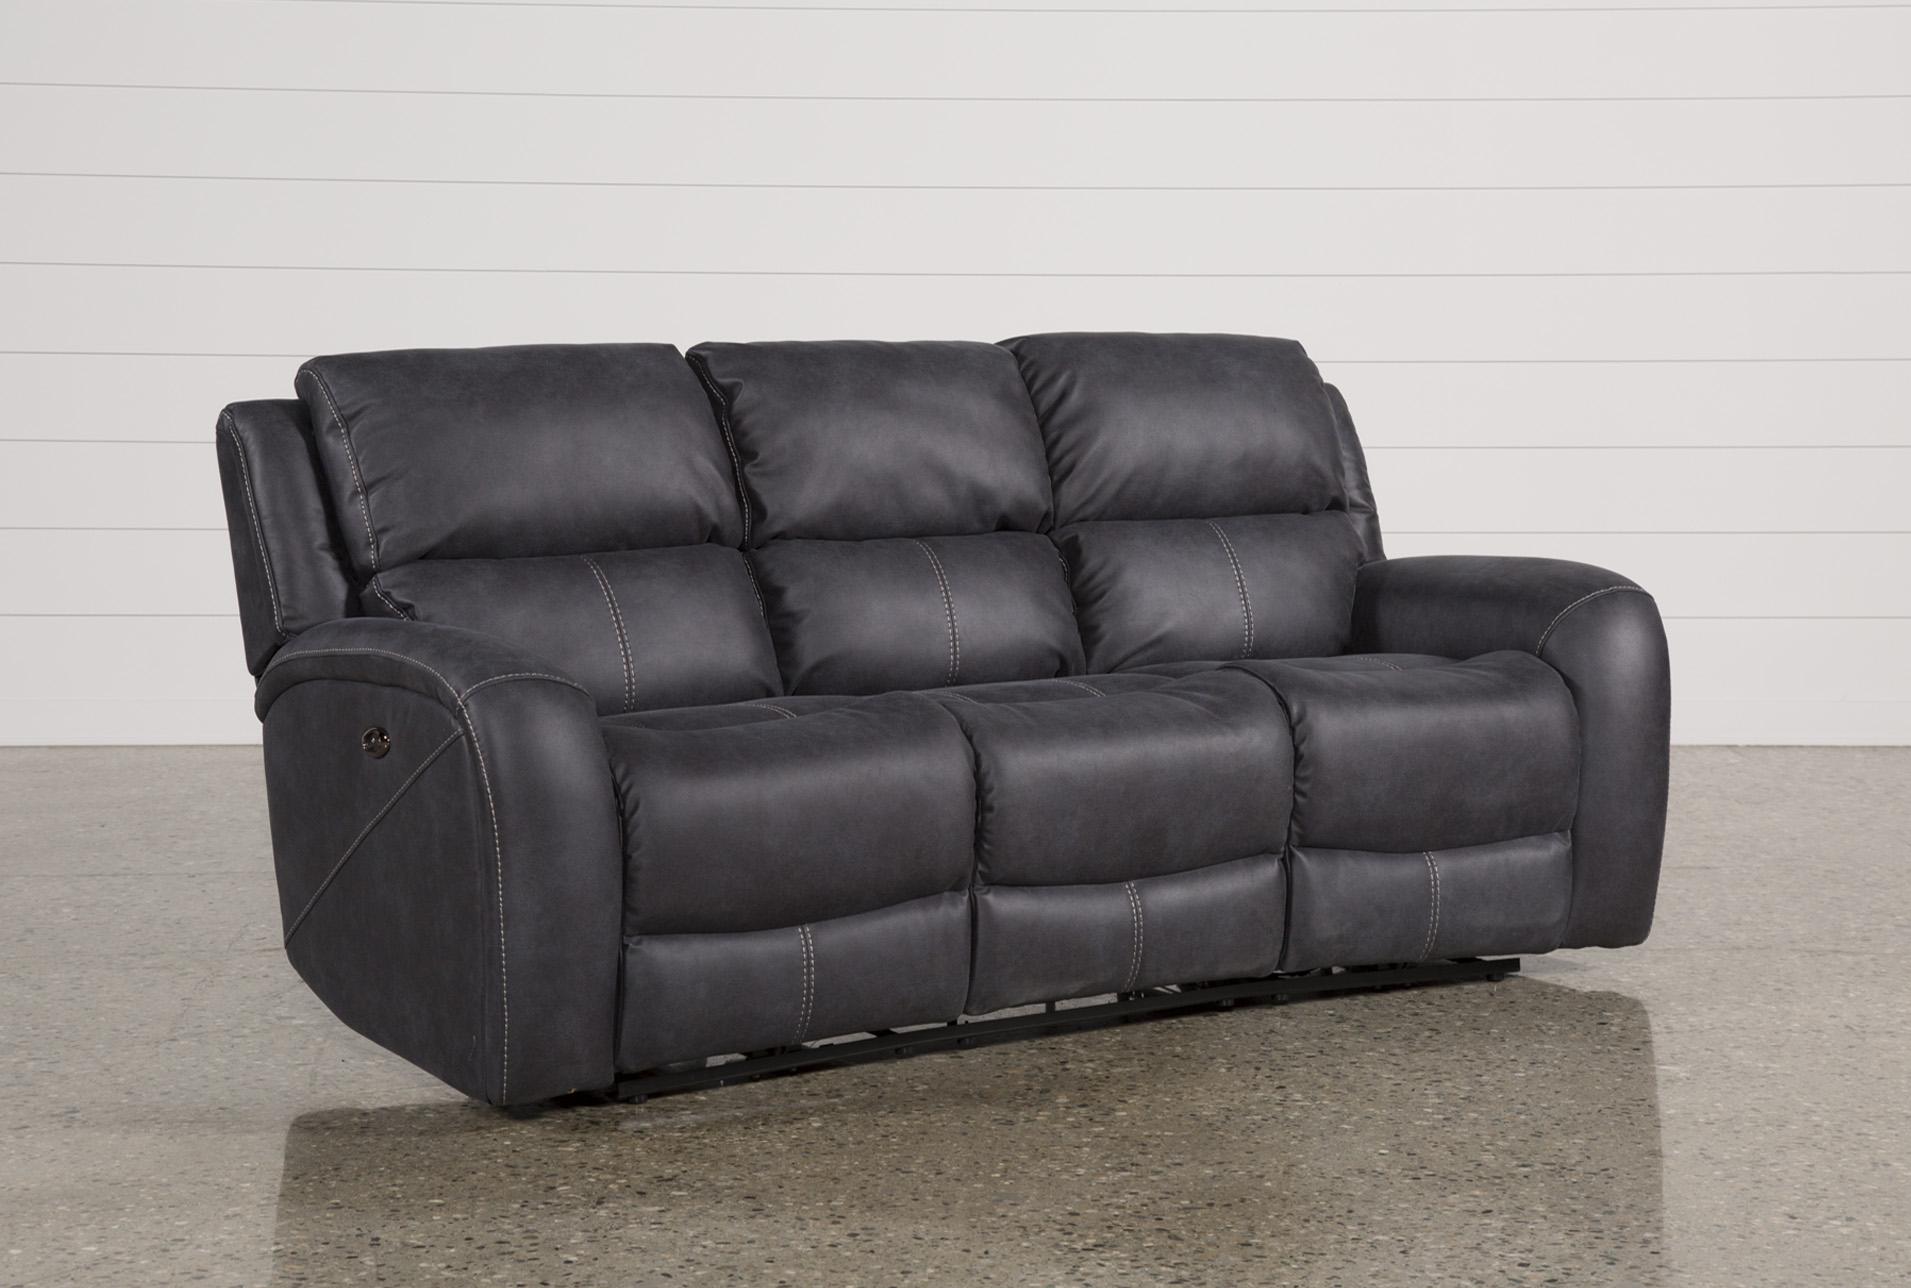 Deegan Charcoal Power Reclining Sofa   360